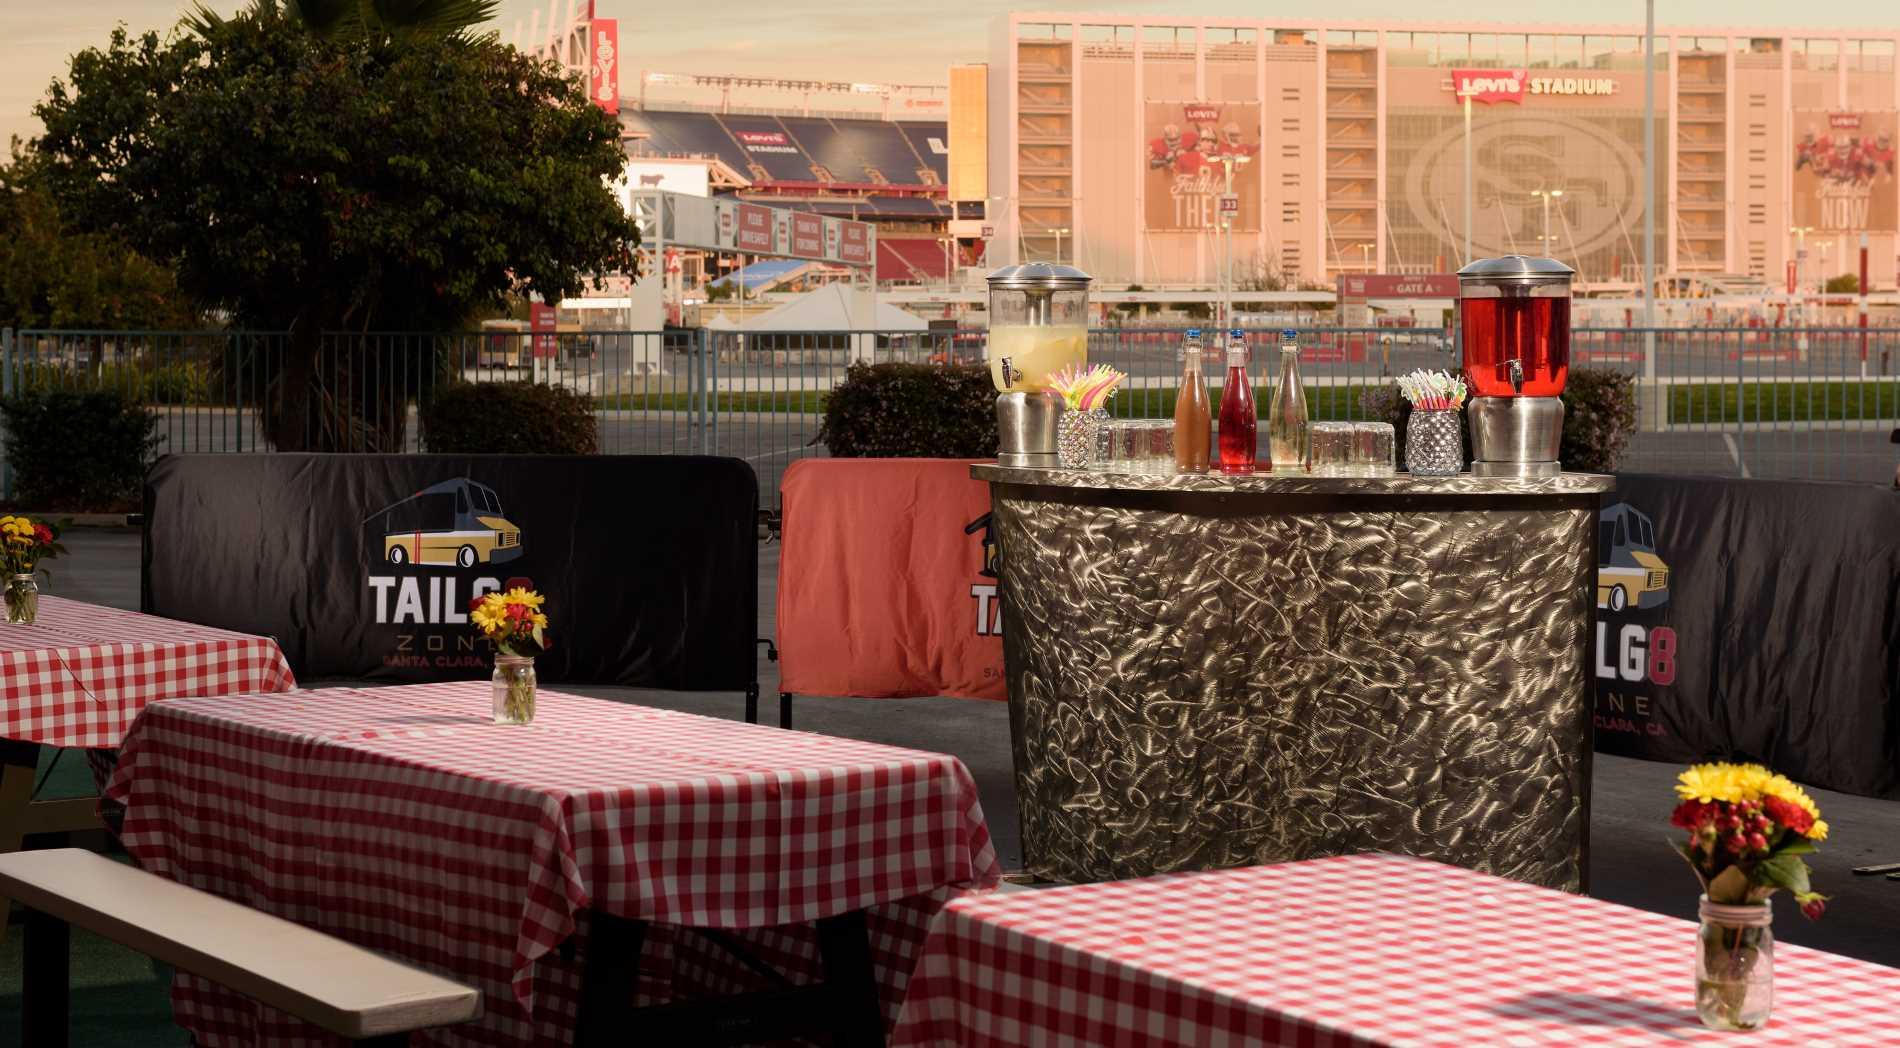 View of Tailg8truck setup outside the Hilton Santa Clara Hotel.